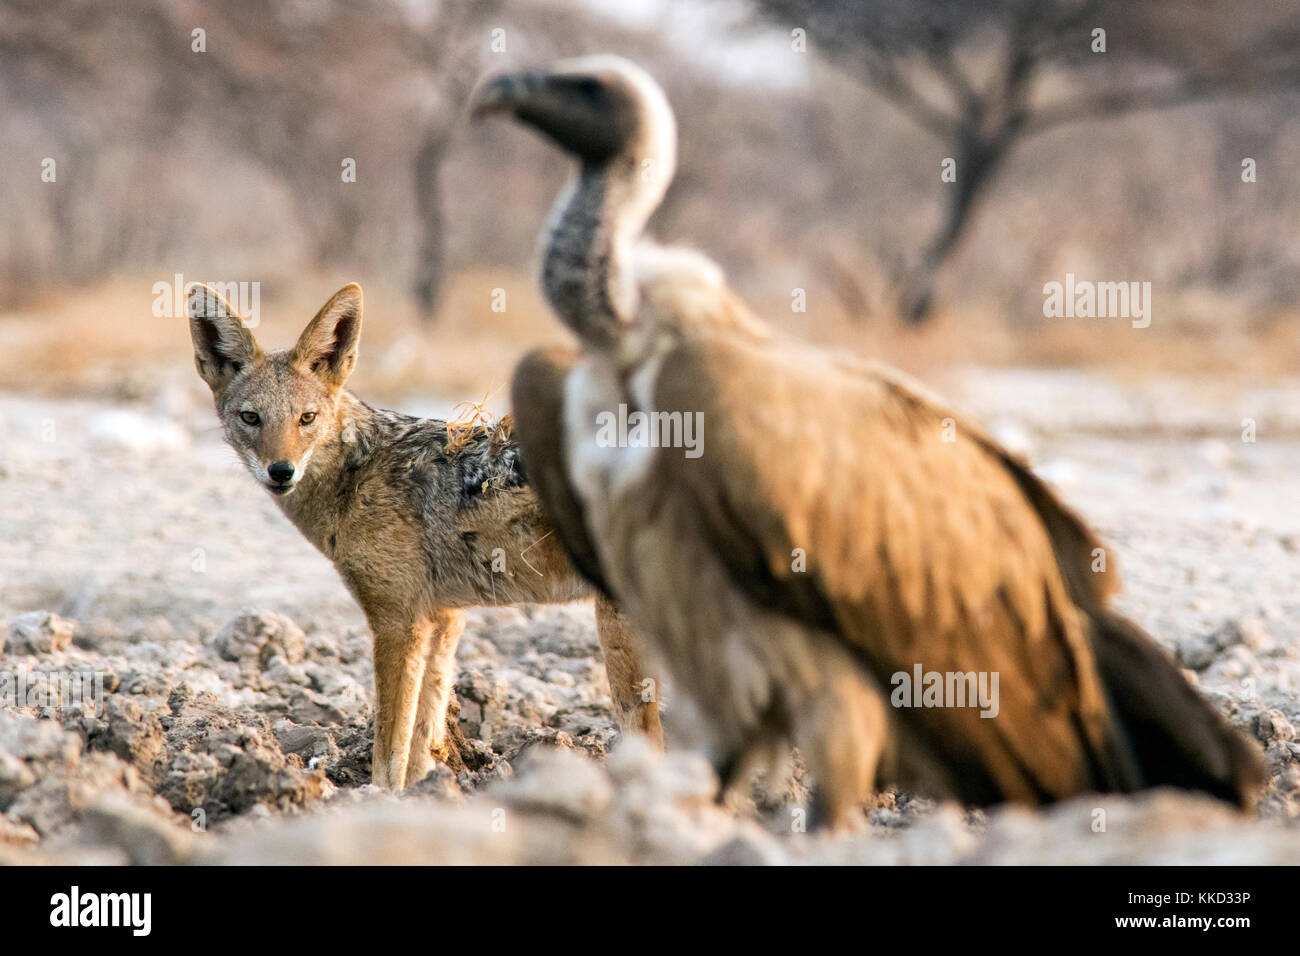 Nero-backed Jackal (Canis mesomelas) e bianco-backed Vulture (Gyps africanus) - Onkolo nascondere, Onguma Game Reserve, Immagini Stock